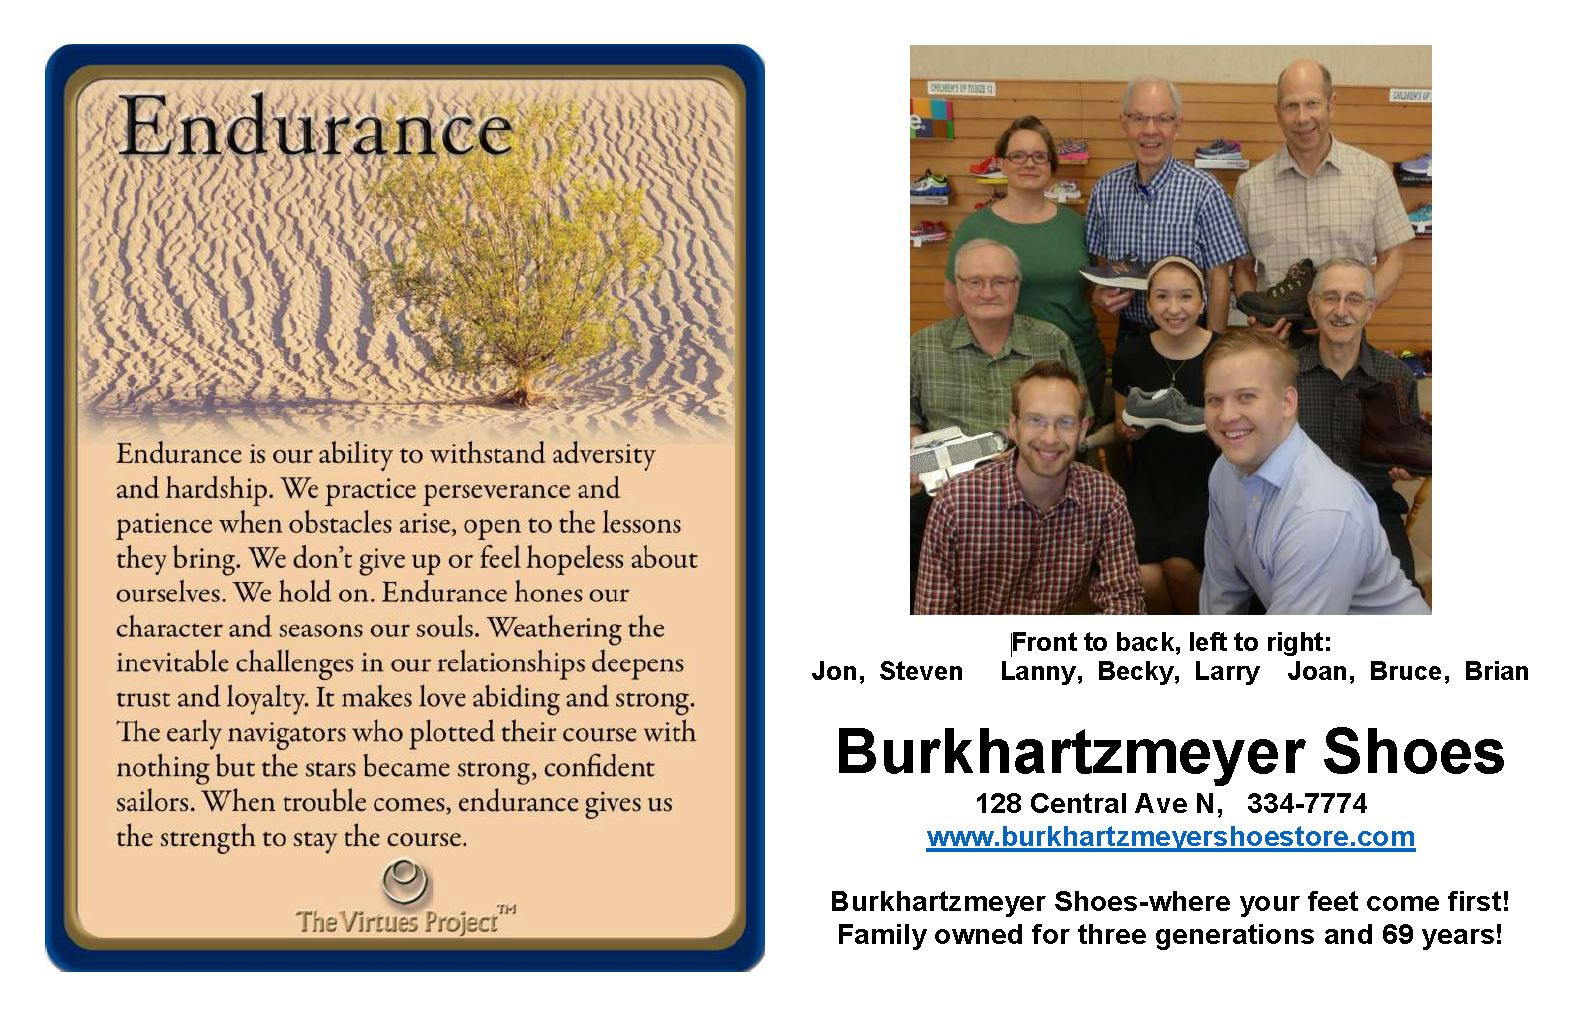 Burkhartzmeyer Shoes Endurance.JPG